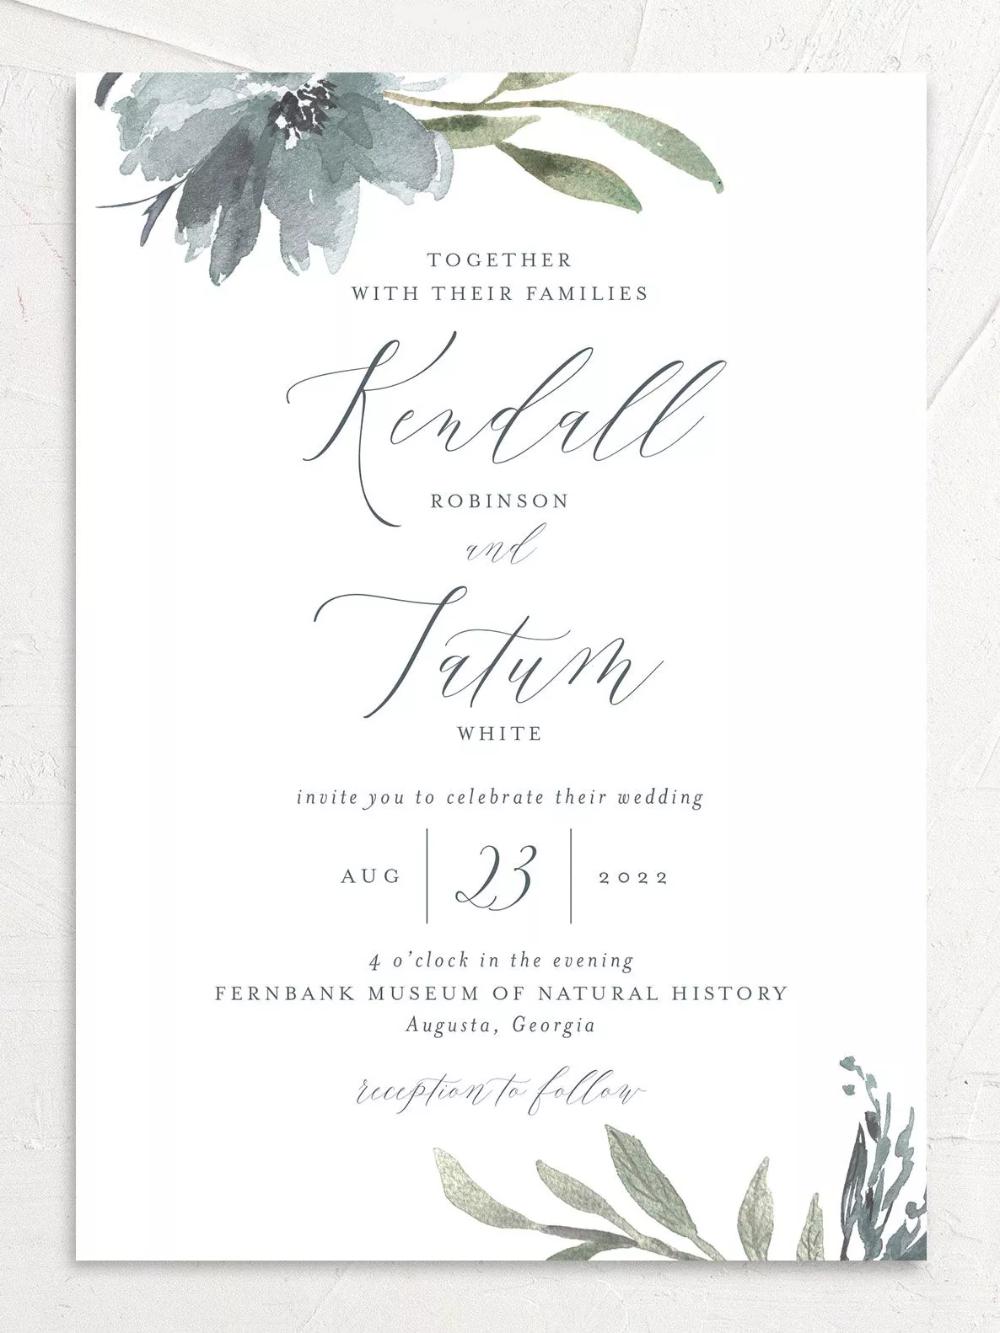 Wedding Invitation Wording For Every Kind Of Celebration In 2021 Wedding Invitation Details Card Sample Wedding Invitation Wording Wedding Reception Invitation Wording